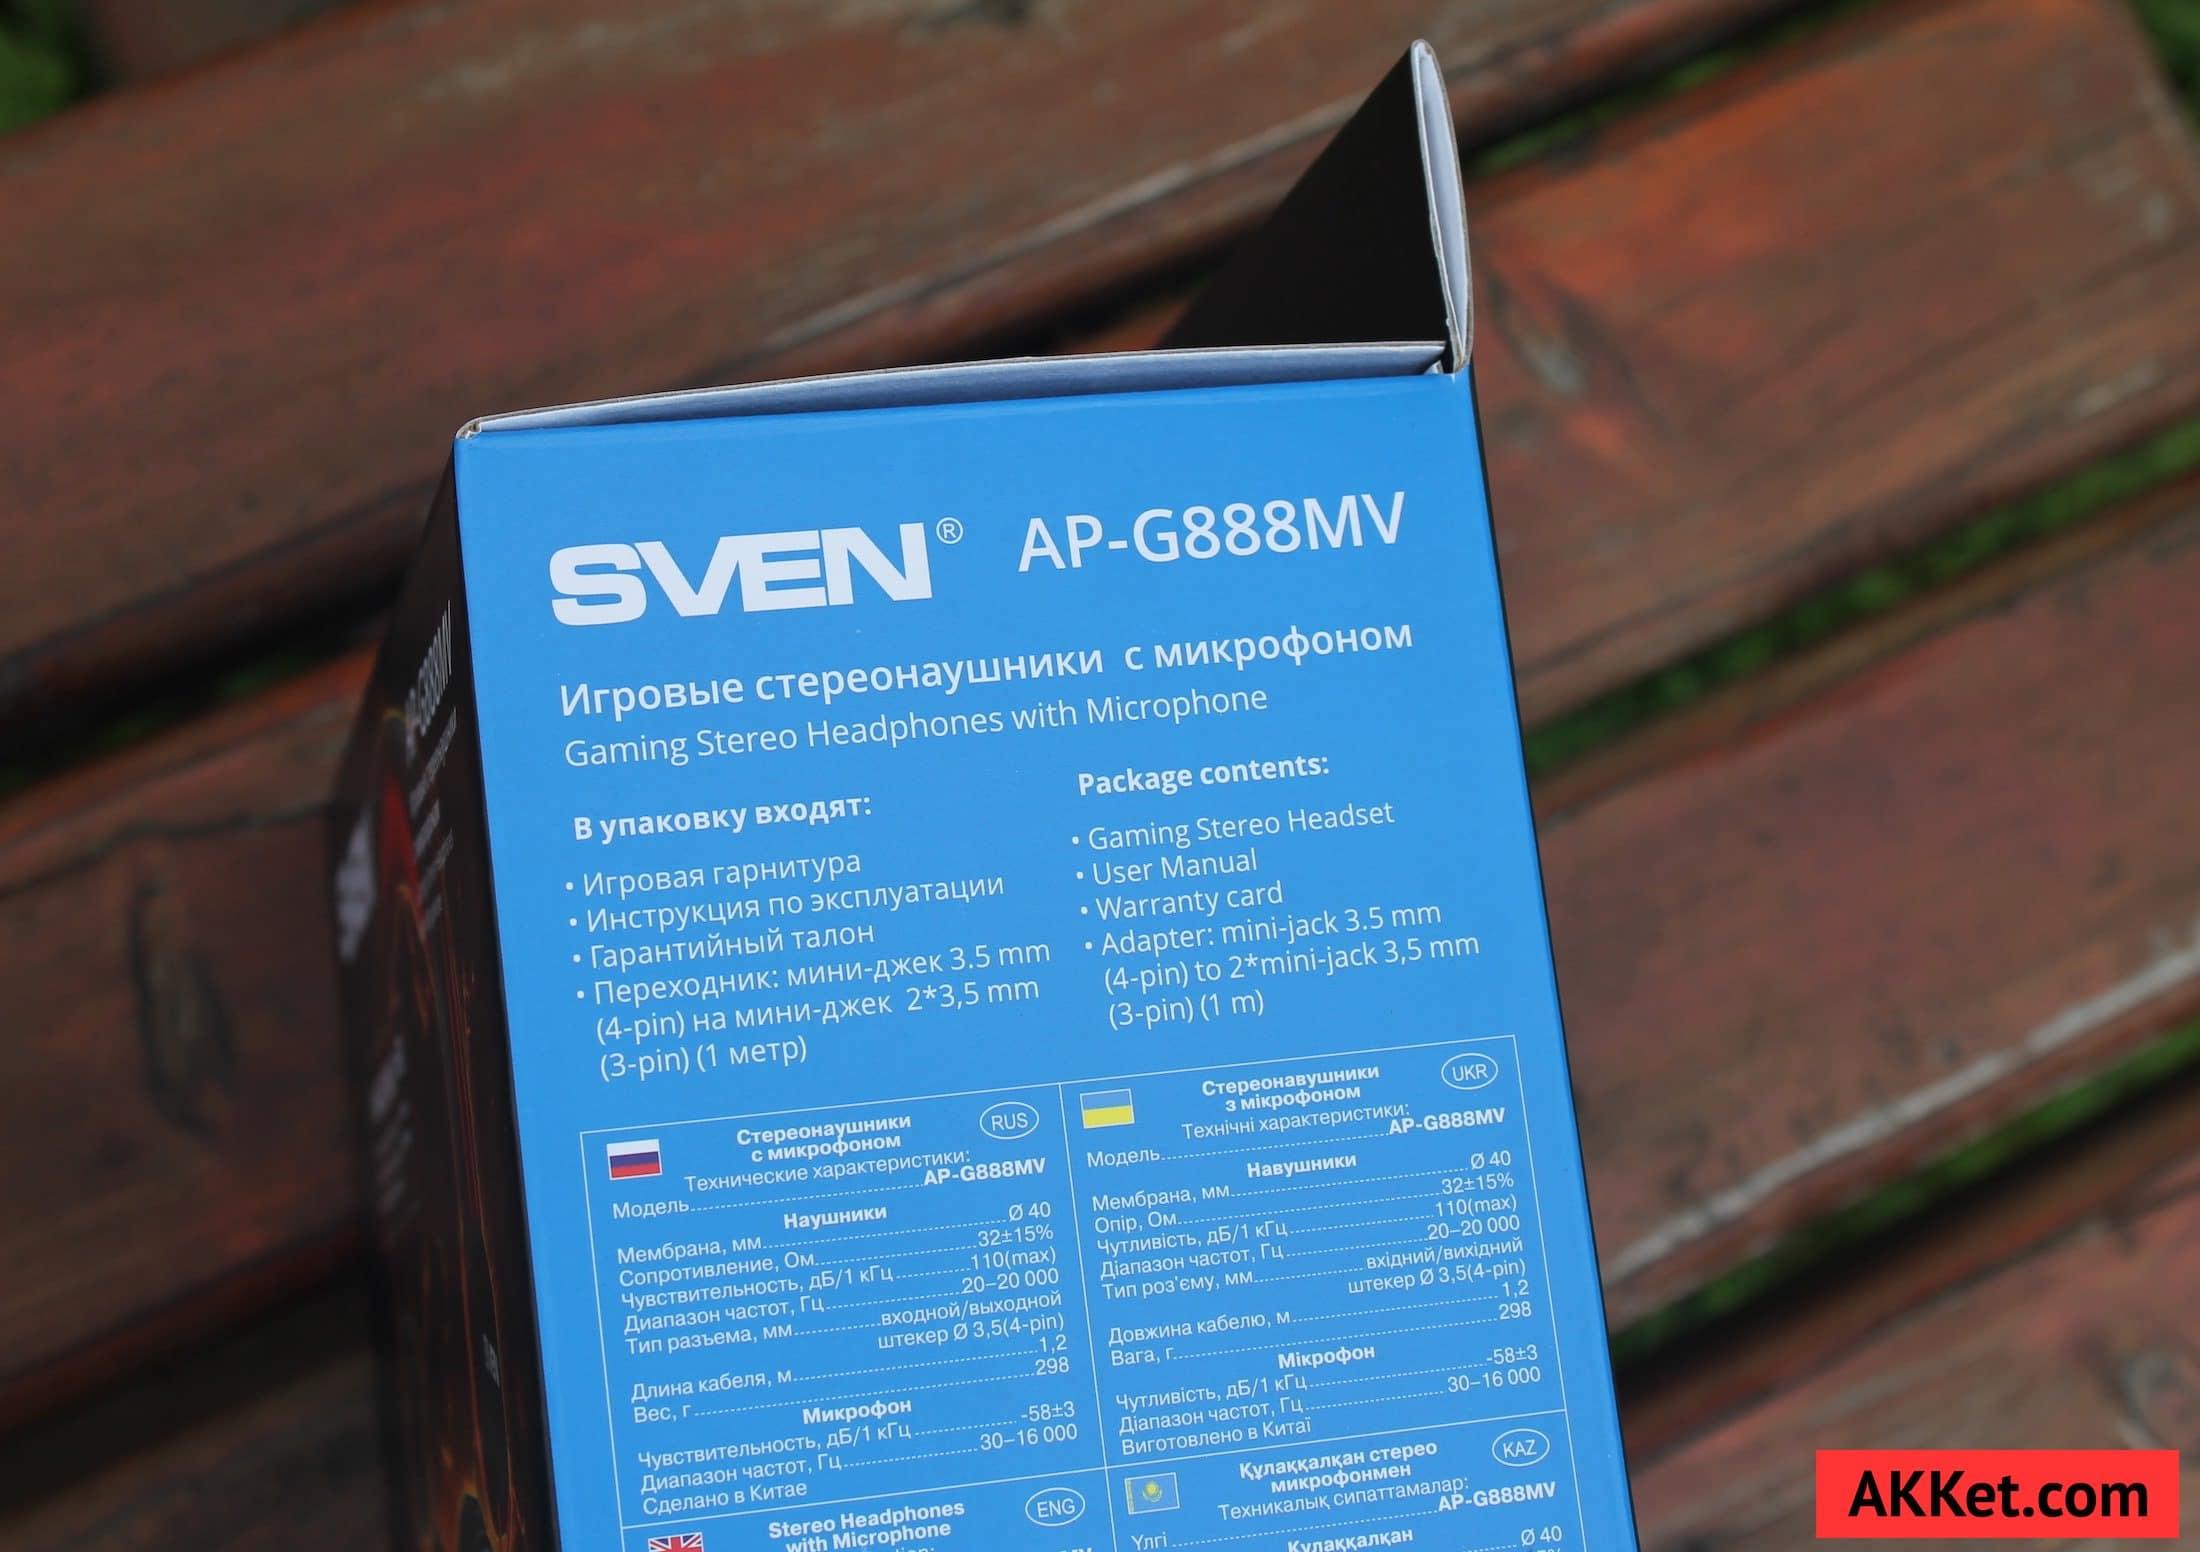 Sven AP-G888MV 17